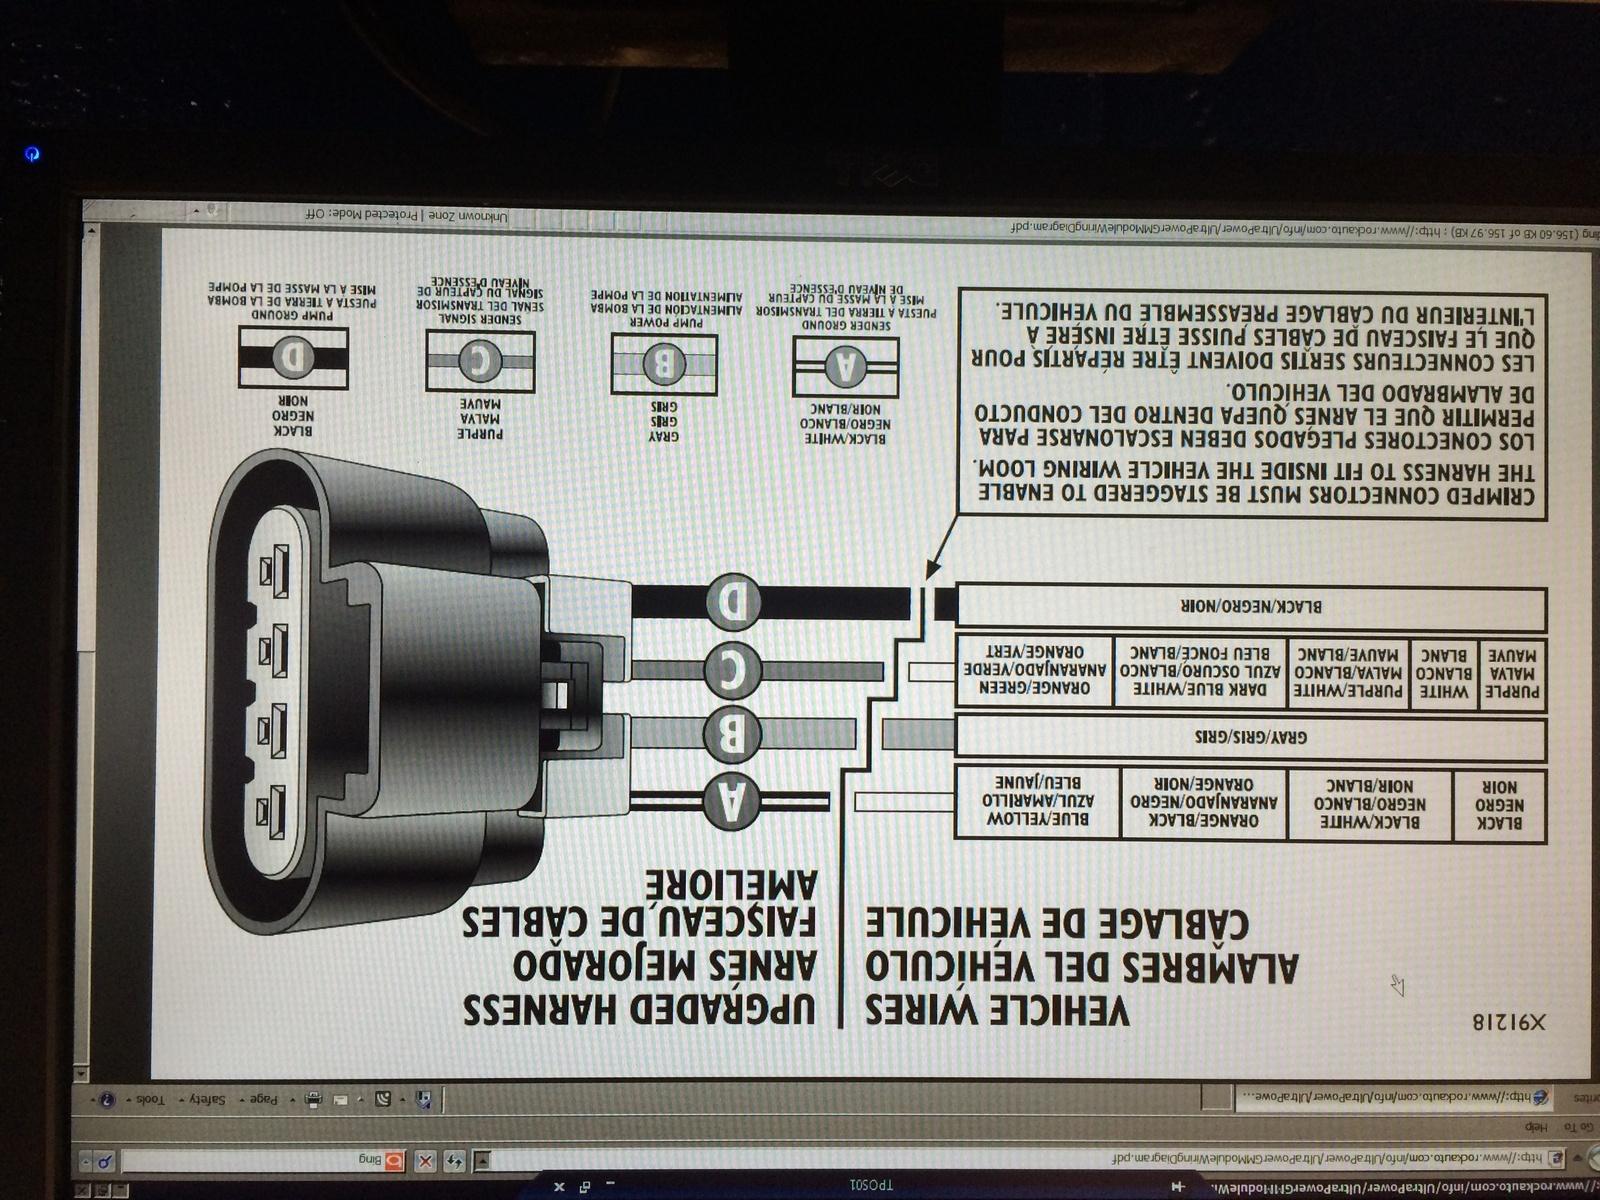 Gmc Sierra 1500 Questions - Fuel Pump Not Engaging On 1998 Gmc K1500 - 2000 Chevy Silverado Fuel Pump Wiring Diagram